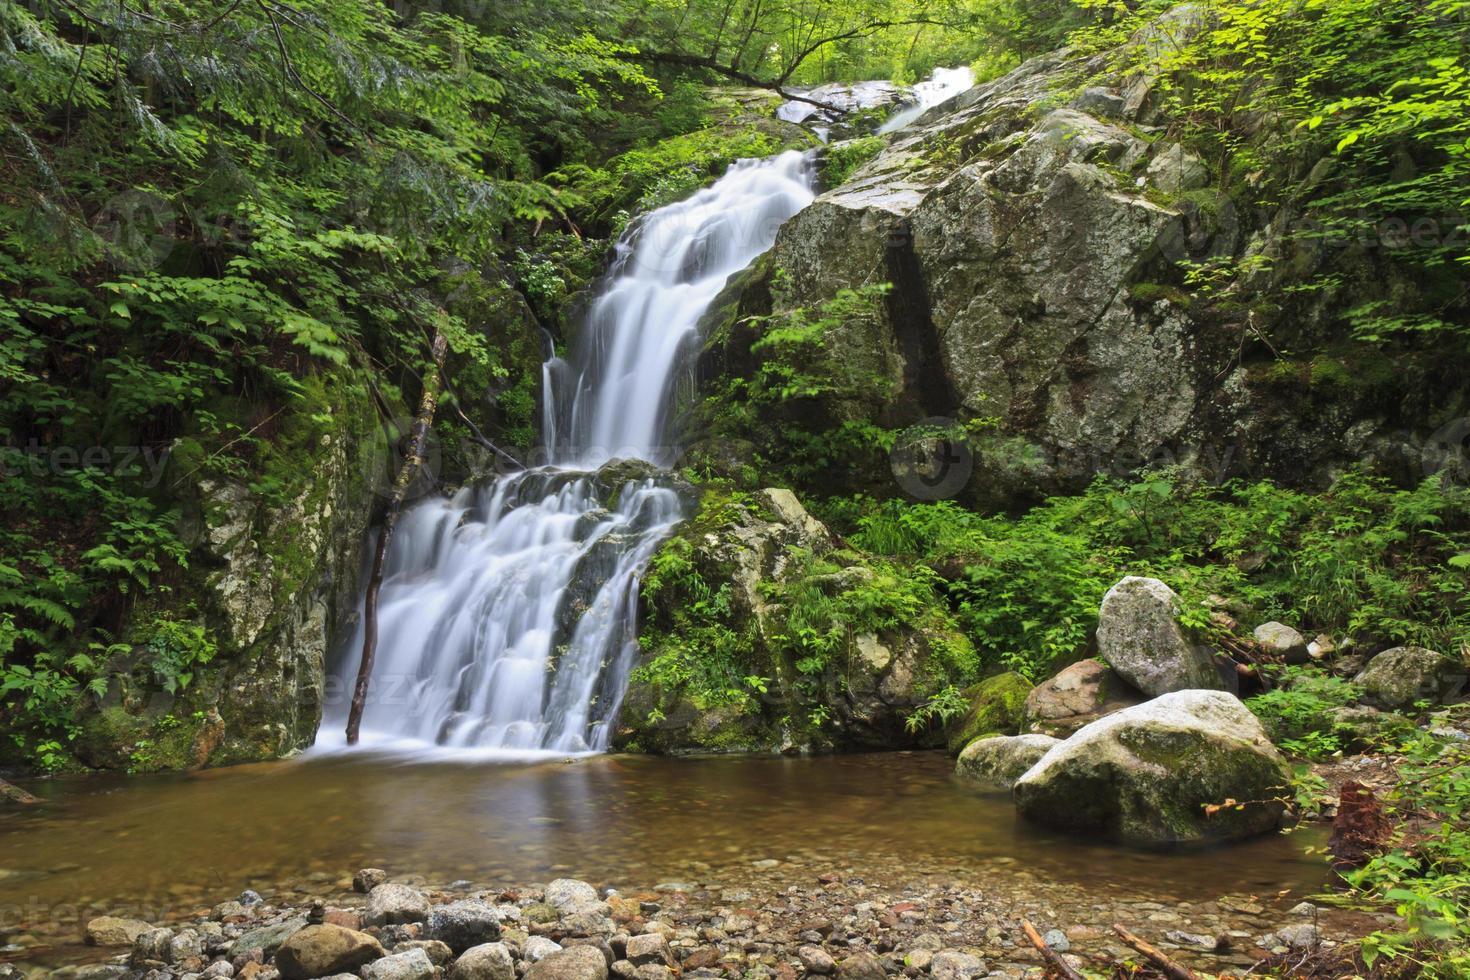 Keilbach Wasserfall und felsiger Pool foto